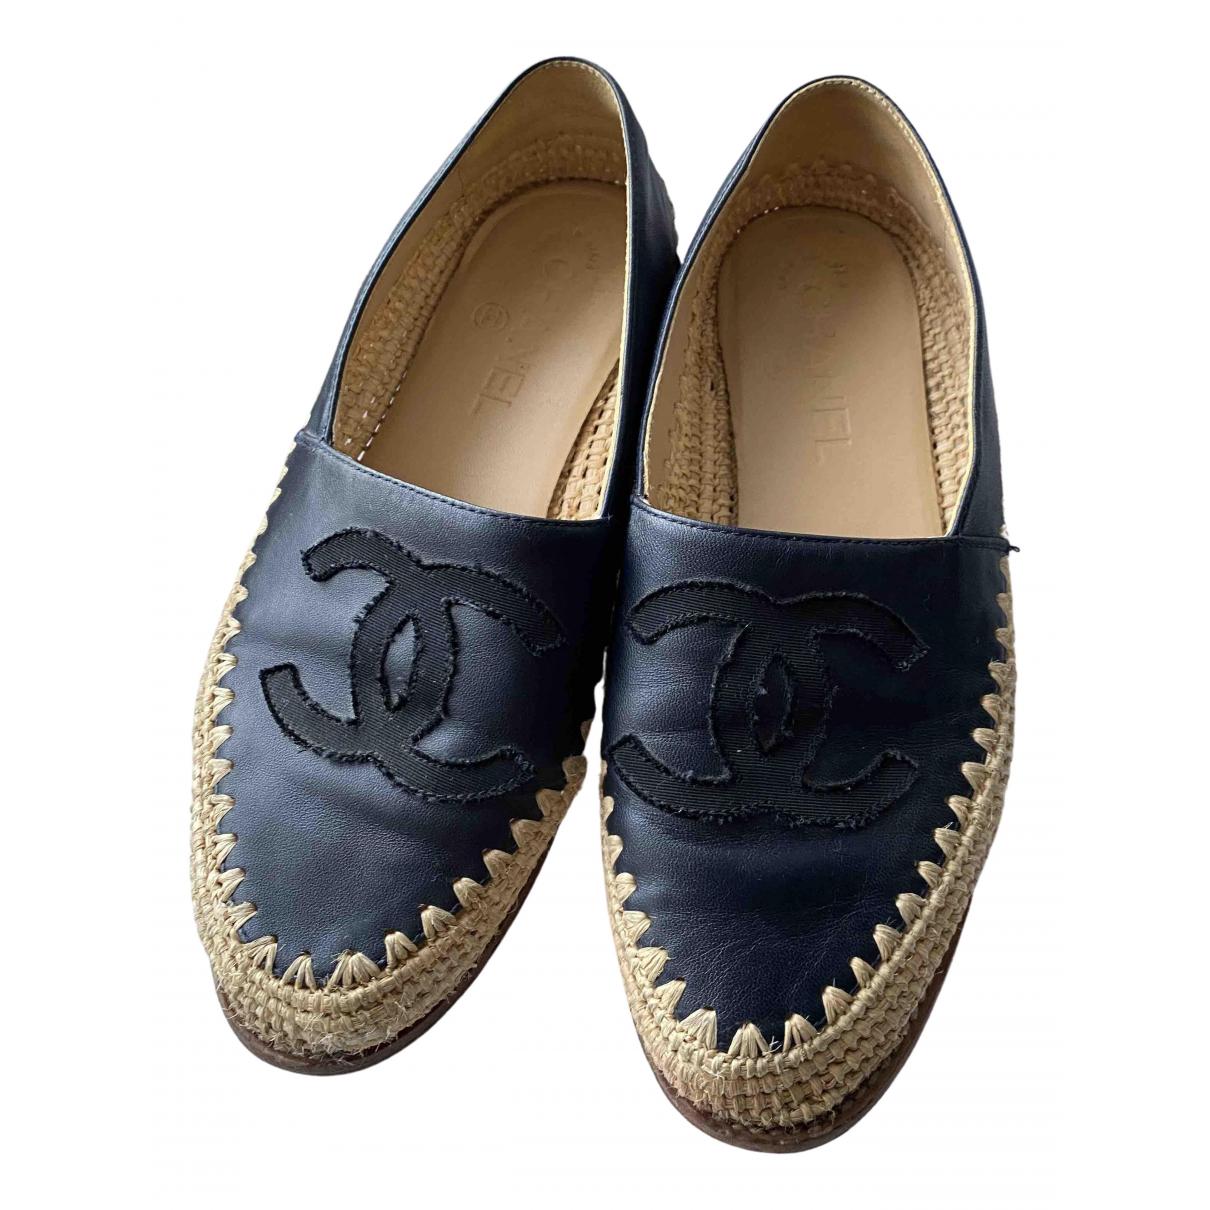 Chanel \N Black Leather Espadrilles for Women 37 EU